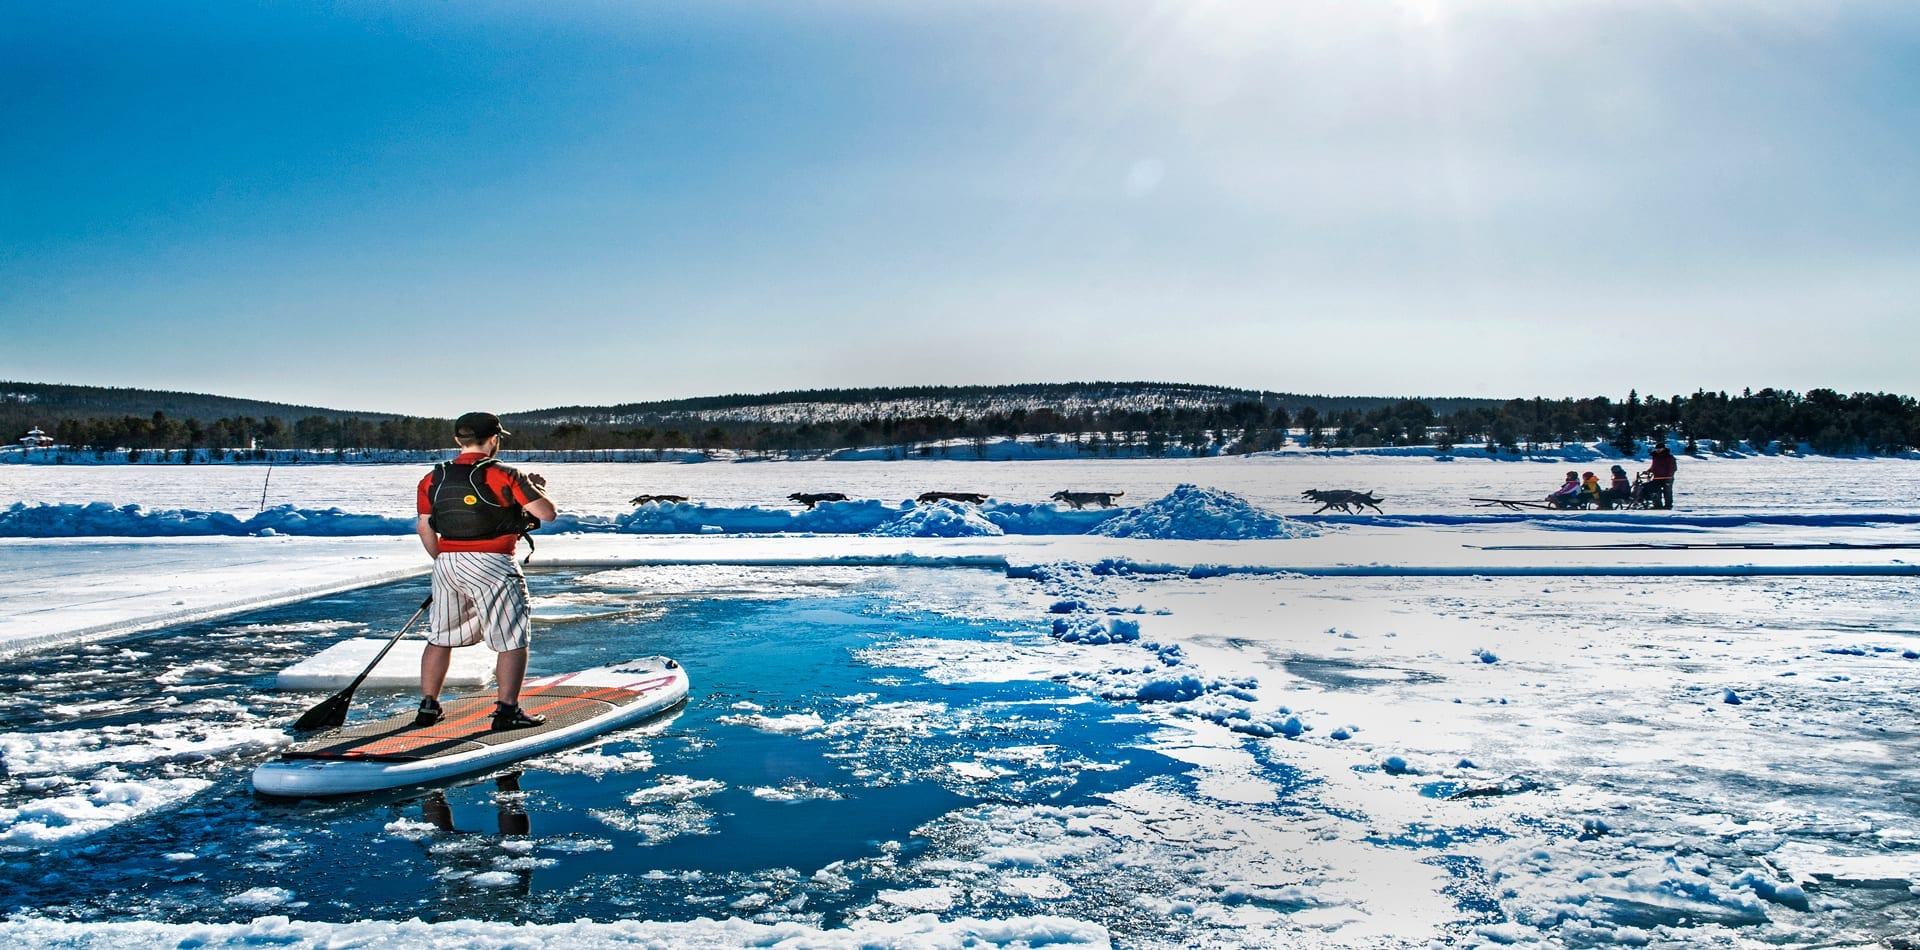 HERO Sweden Ice Hotel Paddle Boarding